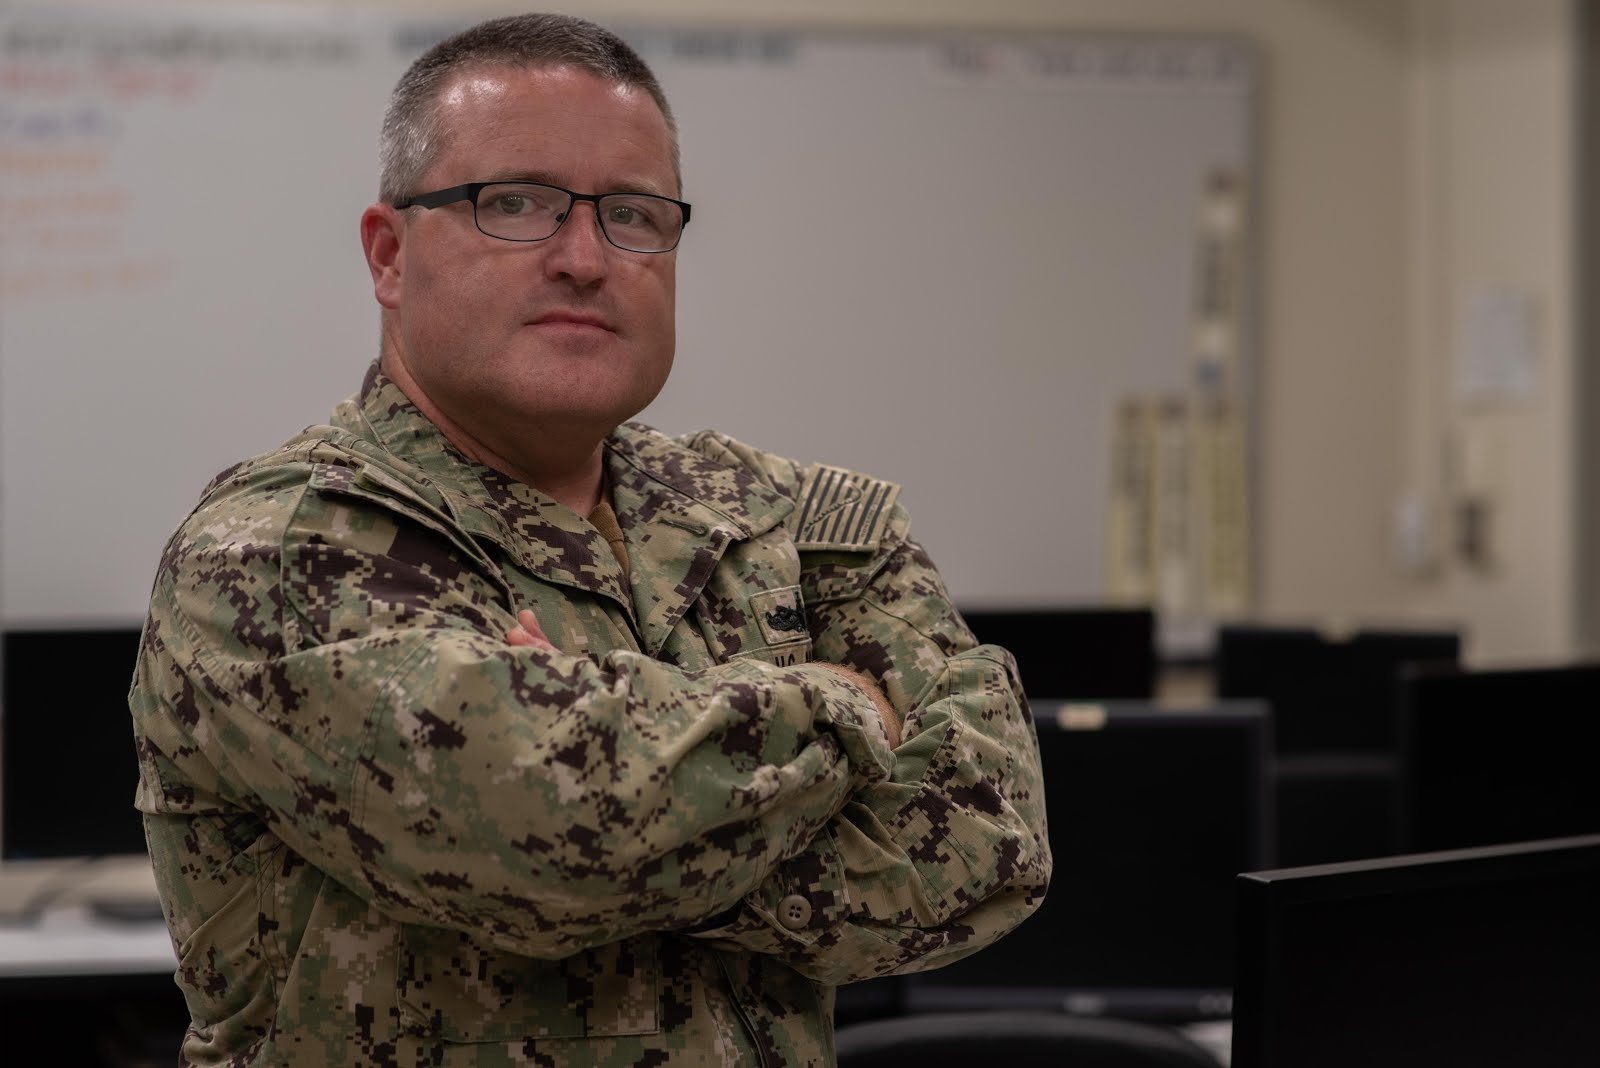 Beall Samuel Allen Texas is Navy Educator